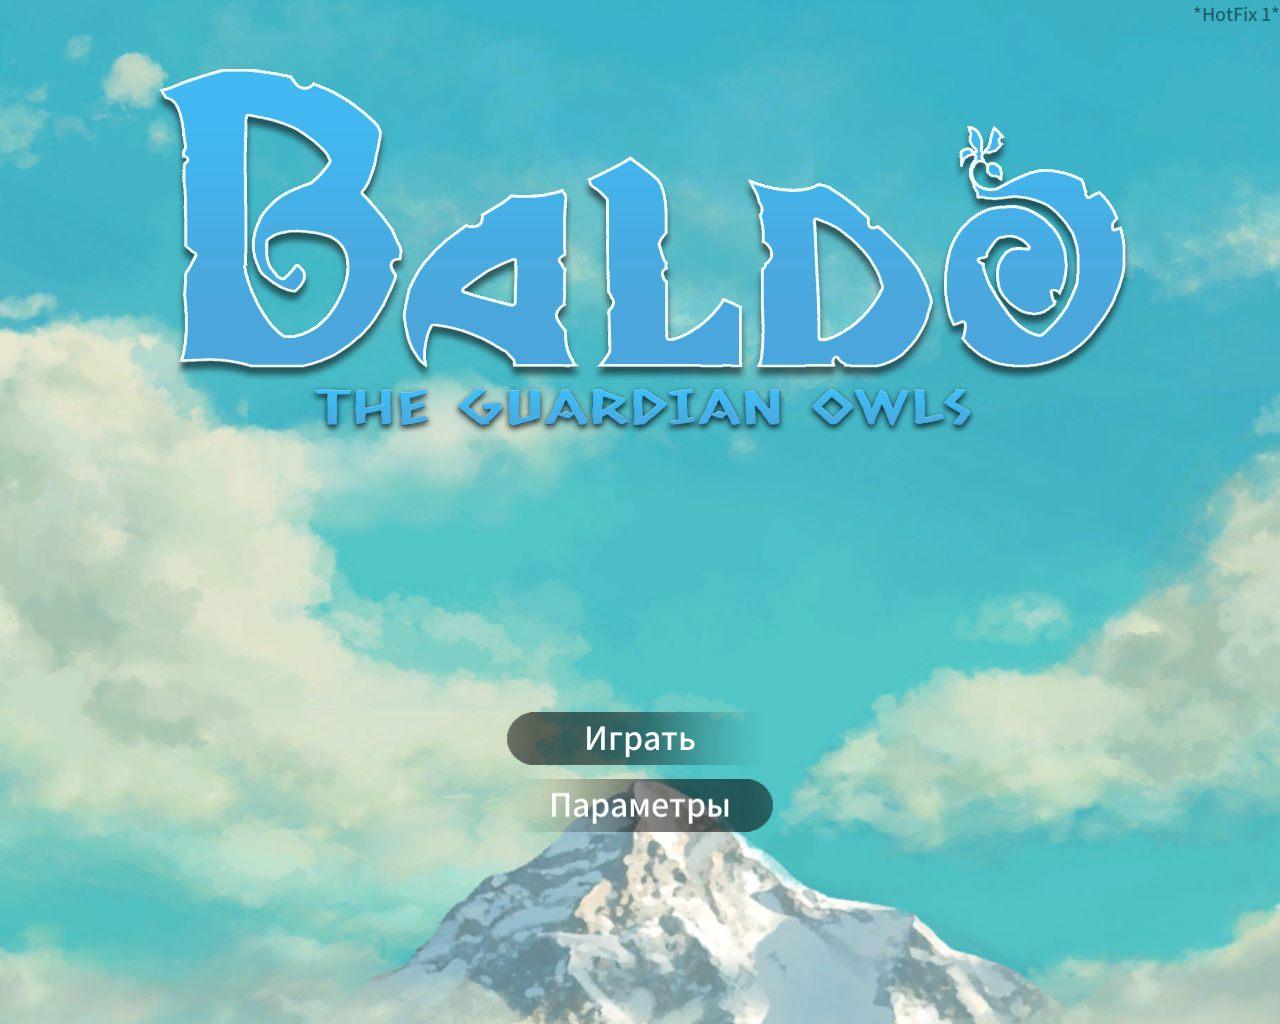 Baldo The guardian owls 2021-09-04 04-35-57-54.bmp.jpg